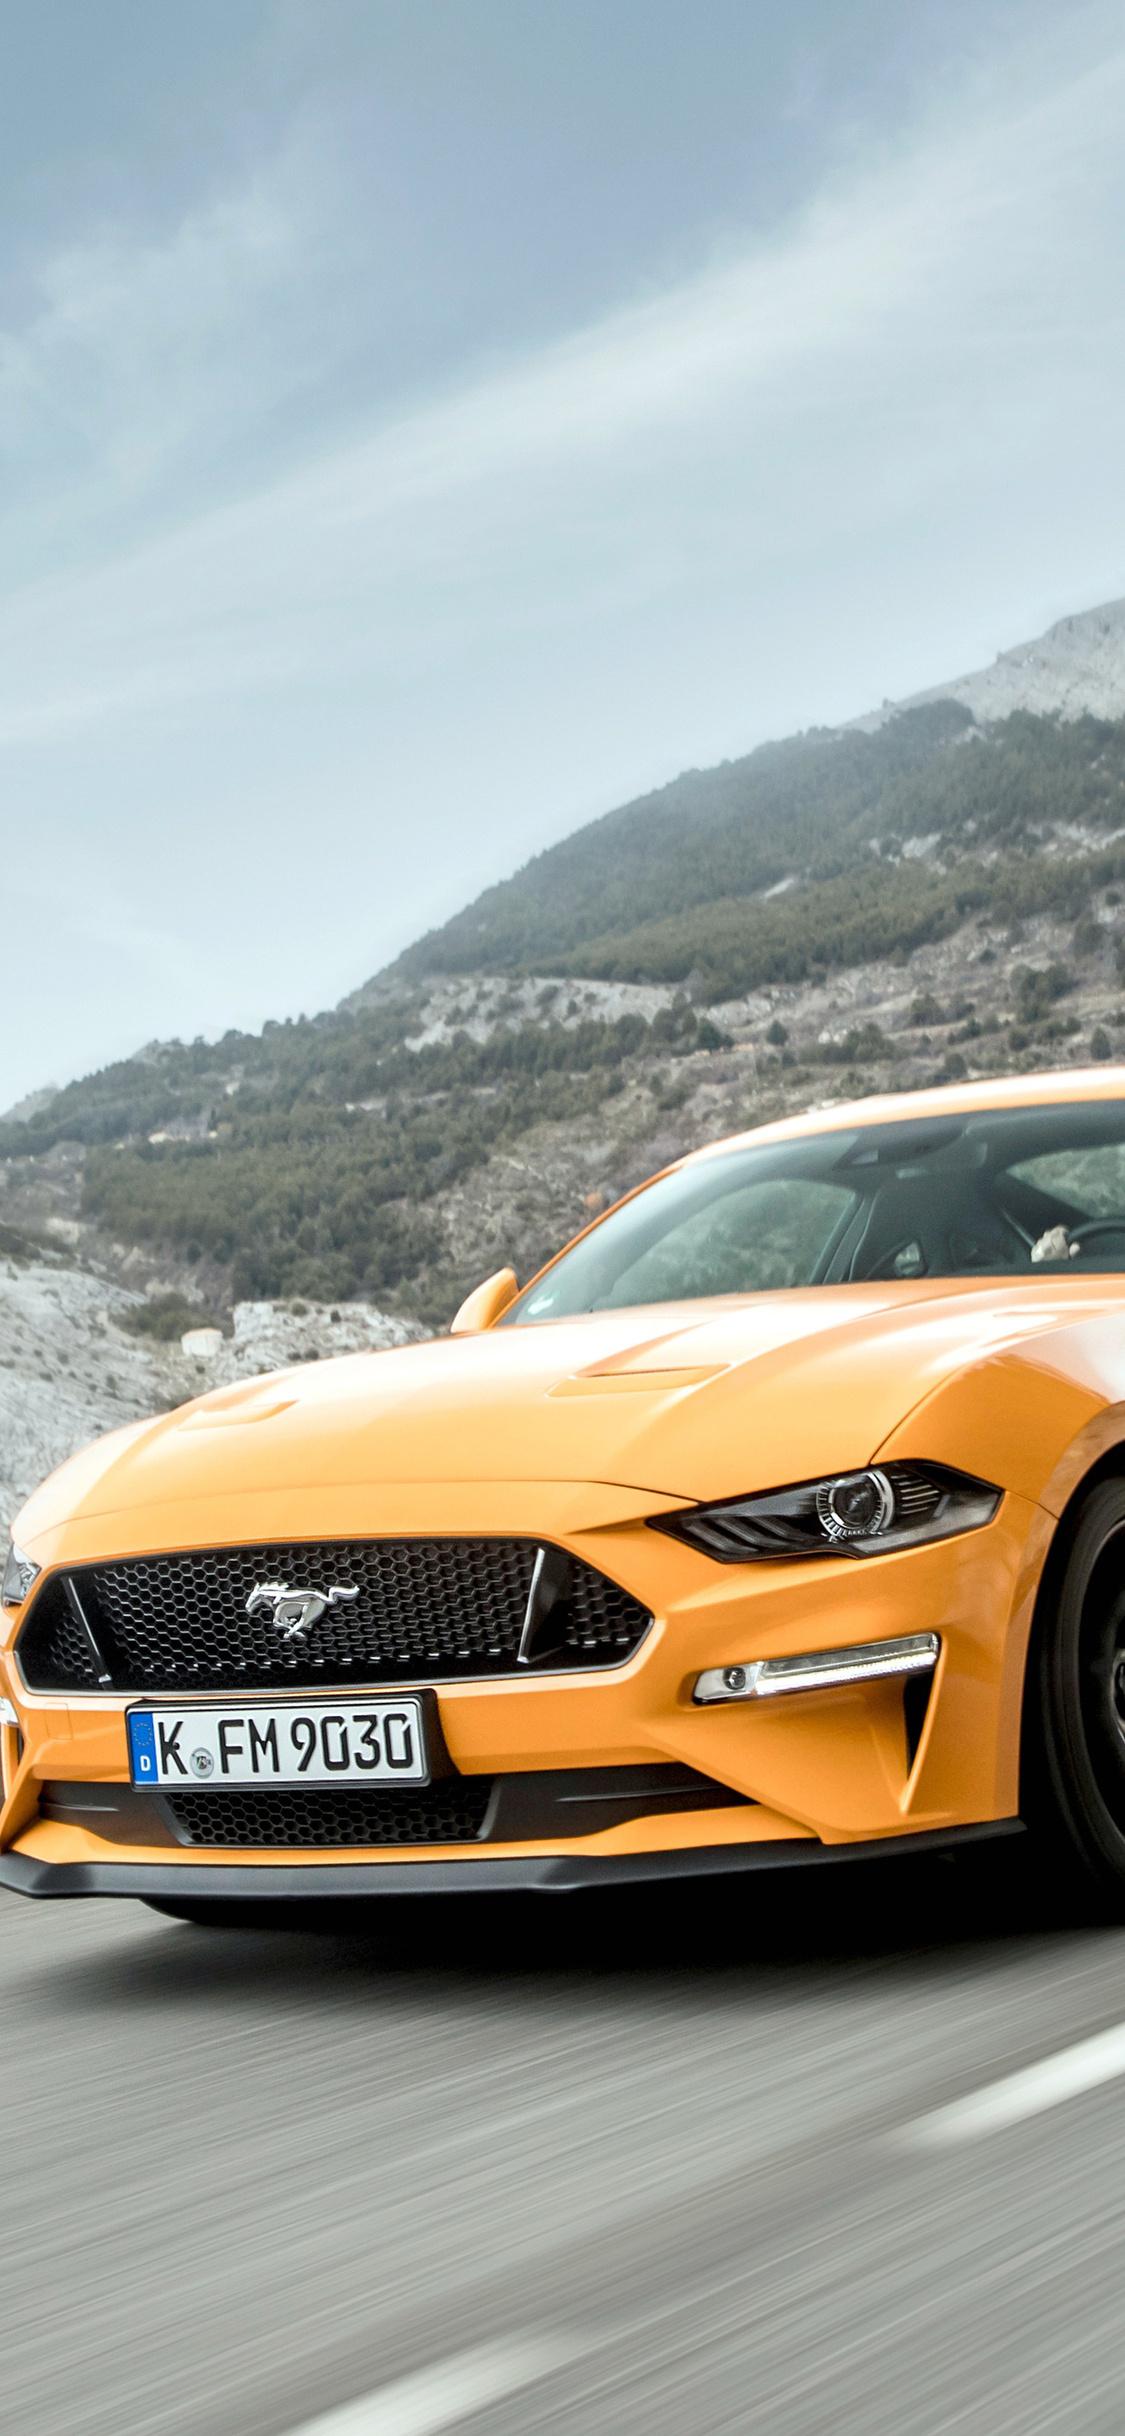 ford-mustang-gt-fastback-qk.jpg